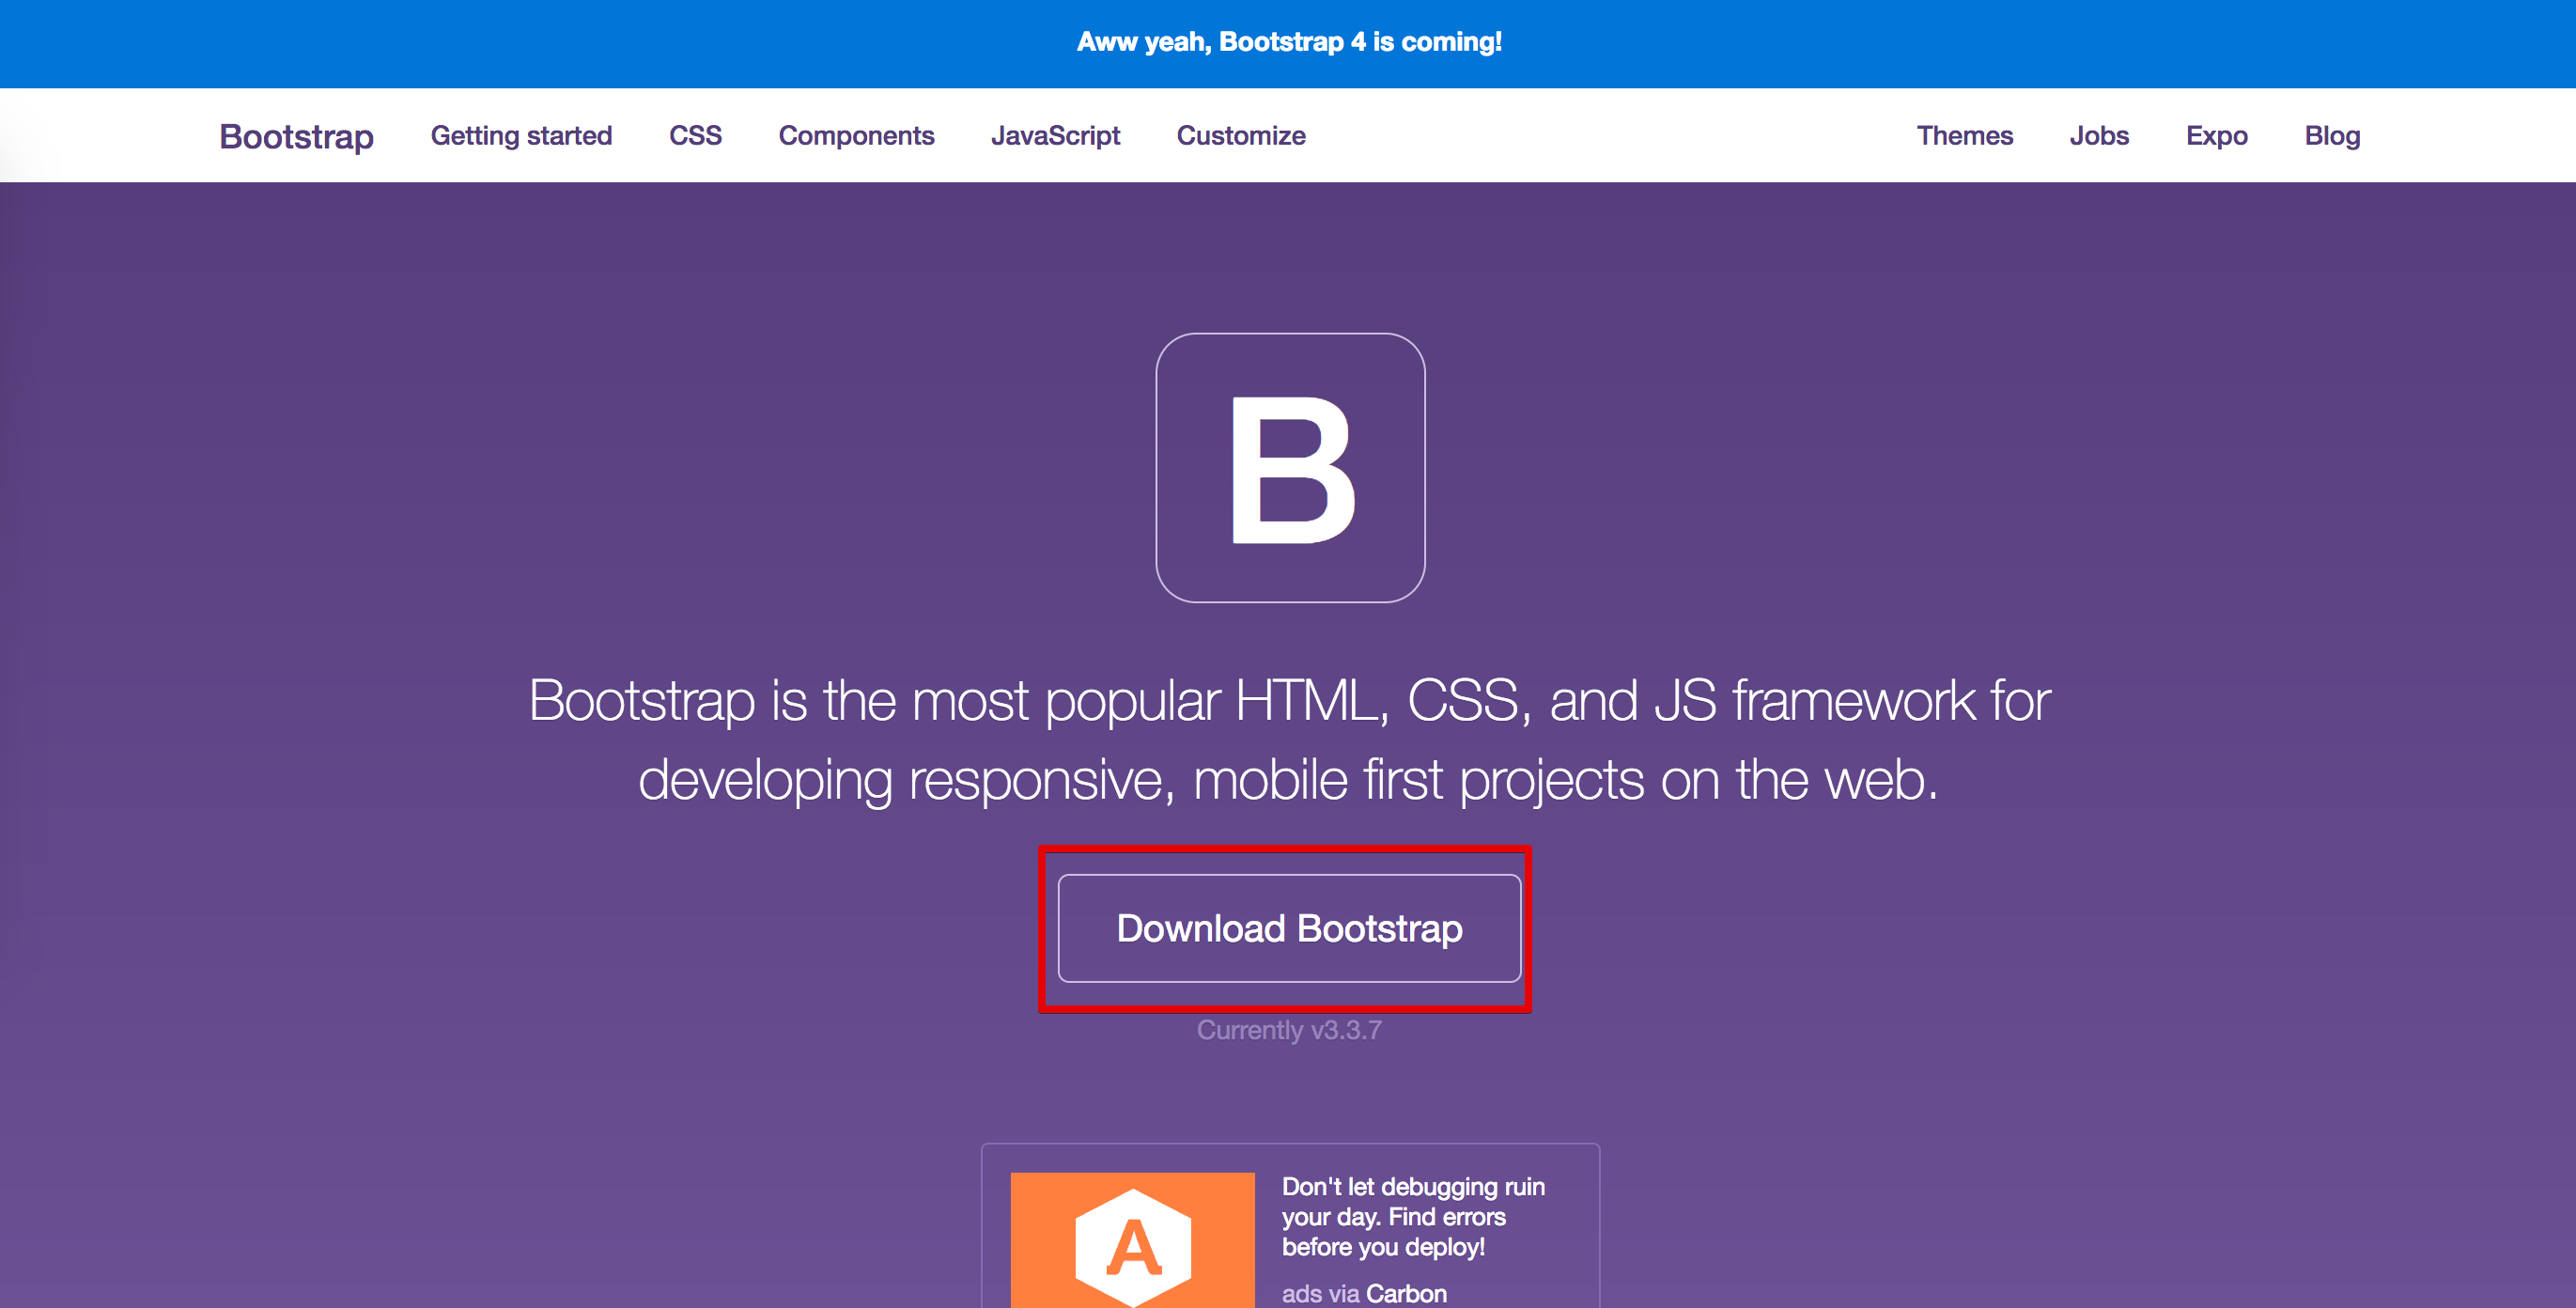 boot - WordPress初心者にオススメ!Bootstrapで楽々CSSが書けるので使い方を簡単に解説